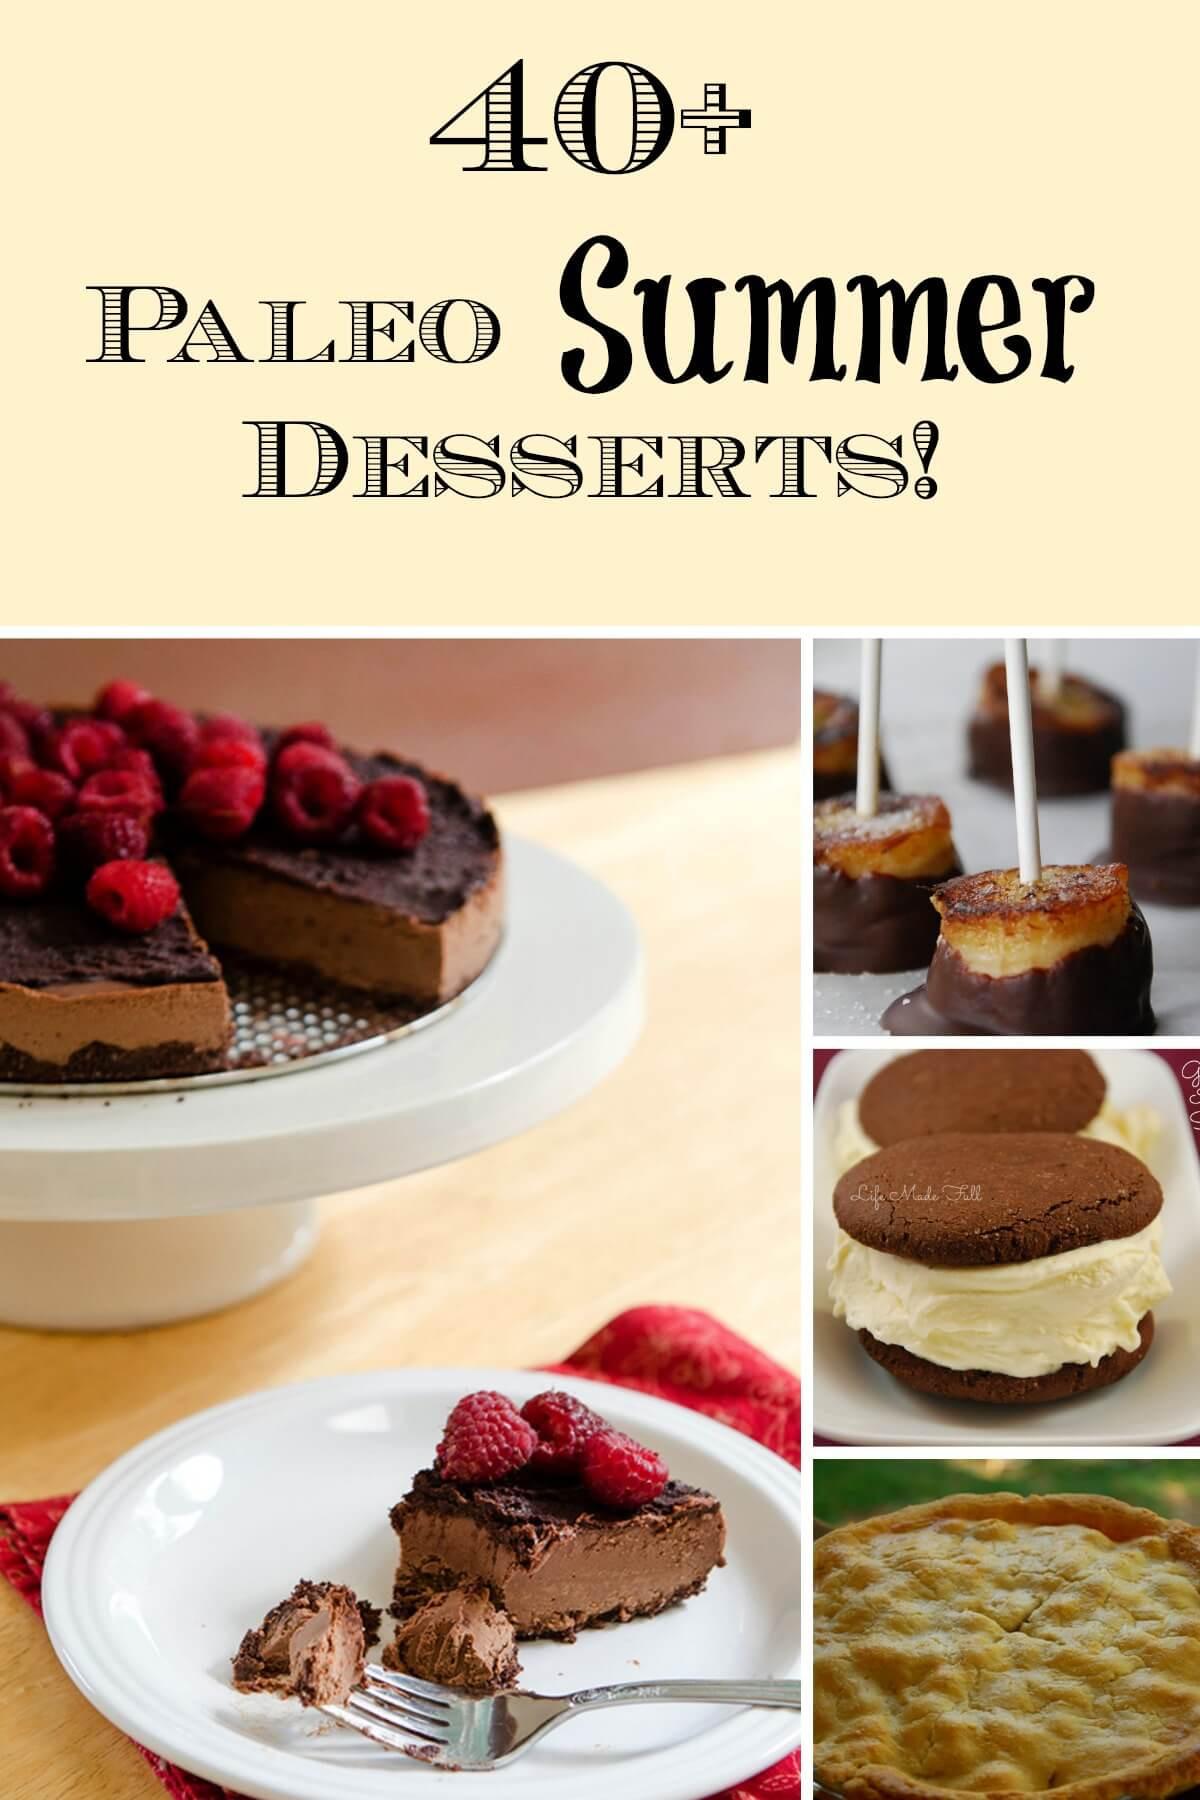 Summer Bbq Desserts  40 Paleo Summer Desserts Life Made Full